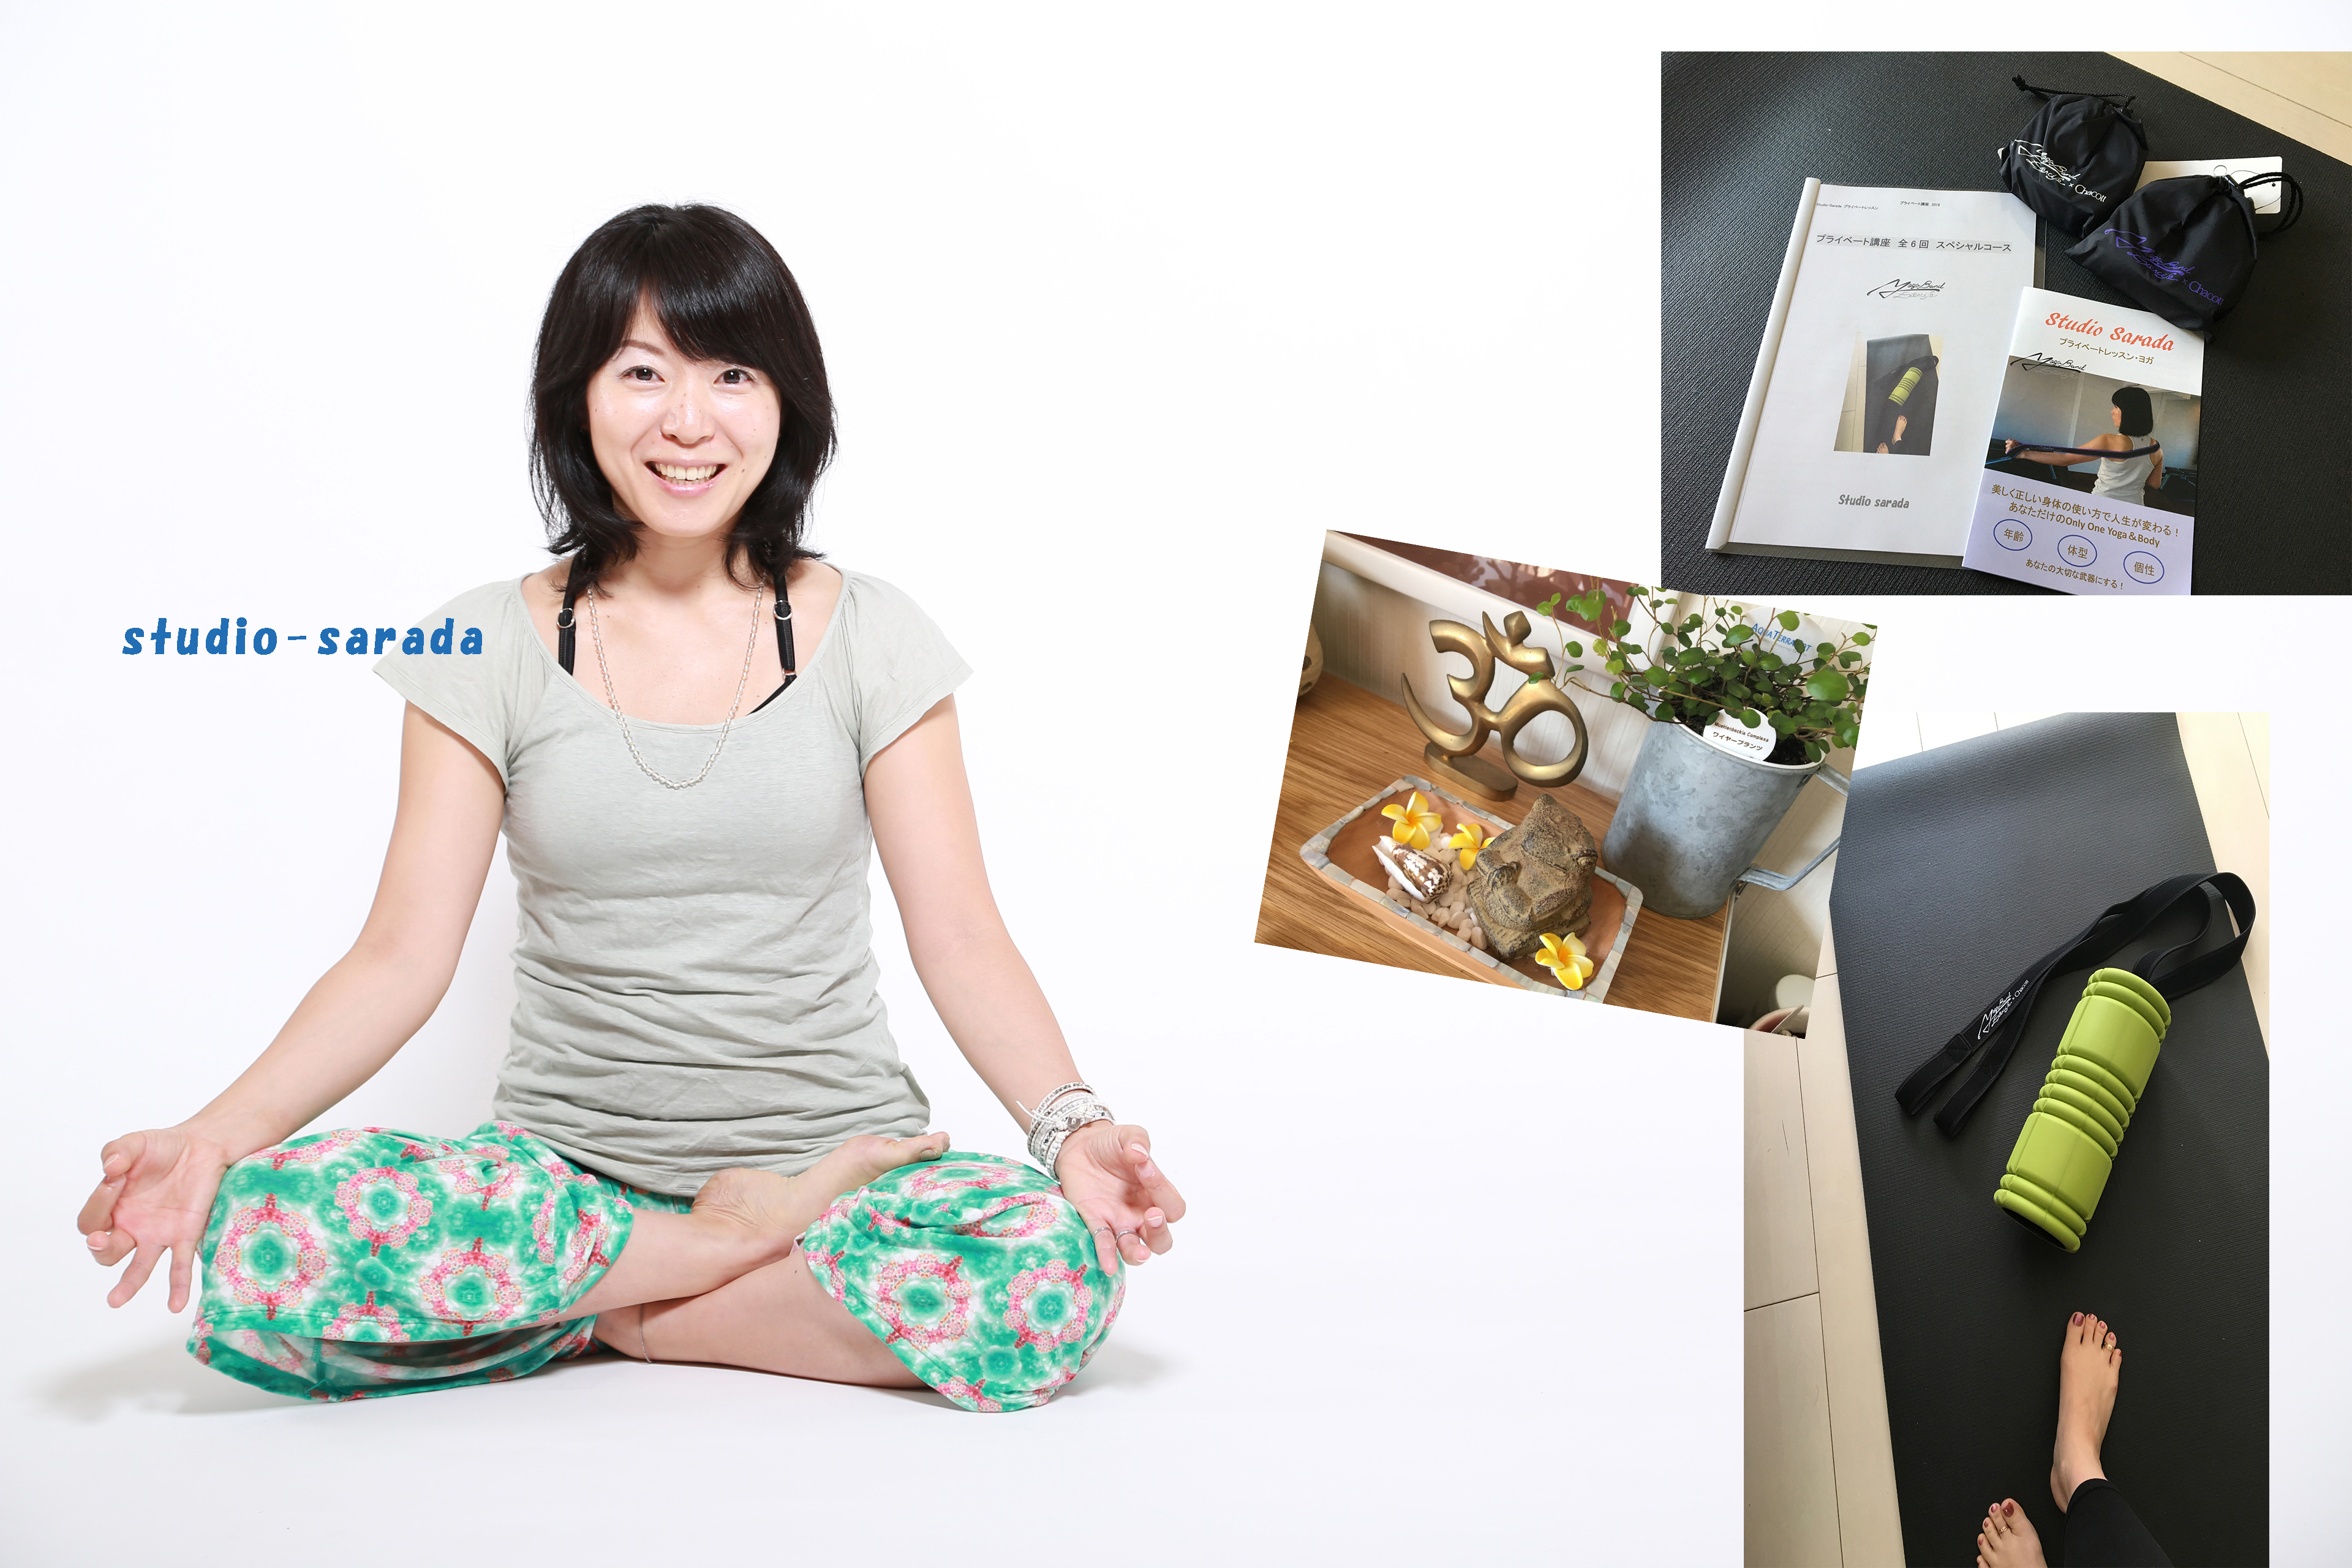 studio-sarada  プライベートヨガ専用スタジオ 横浜市神奈川区